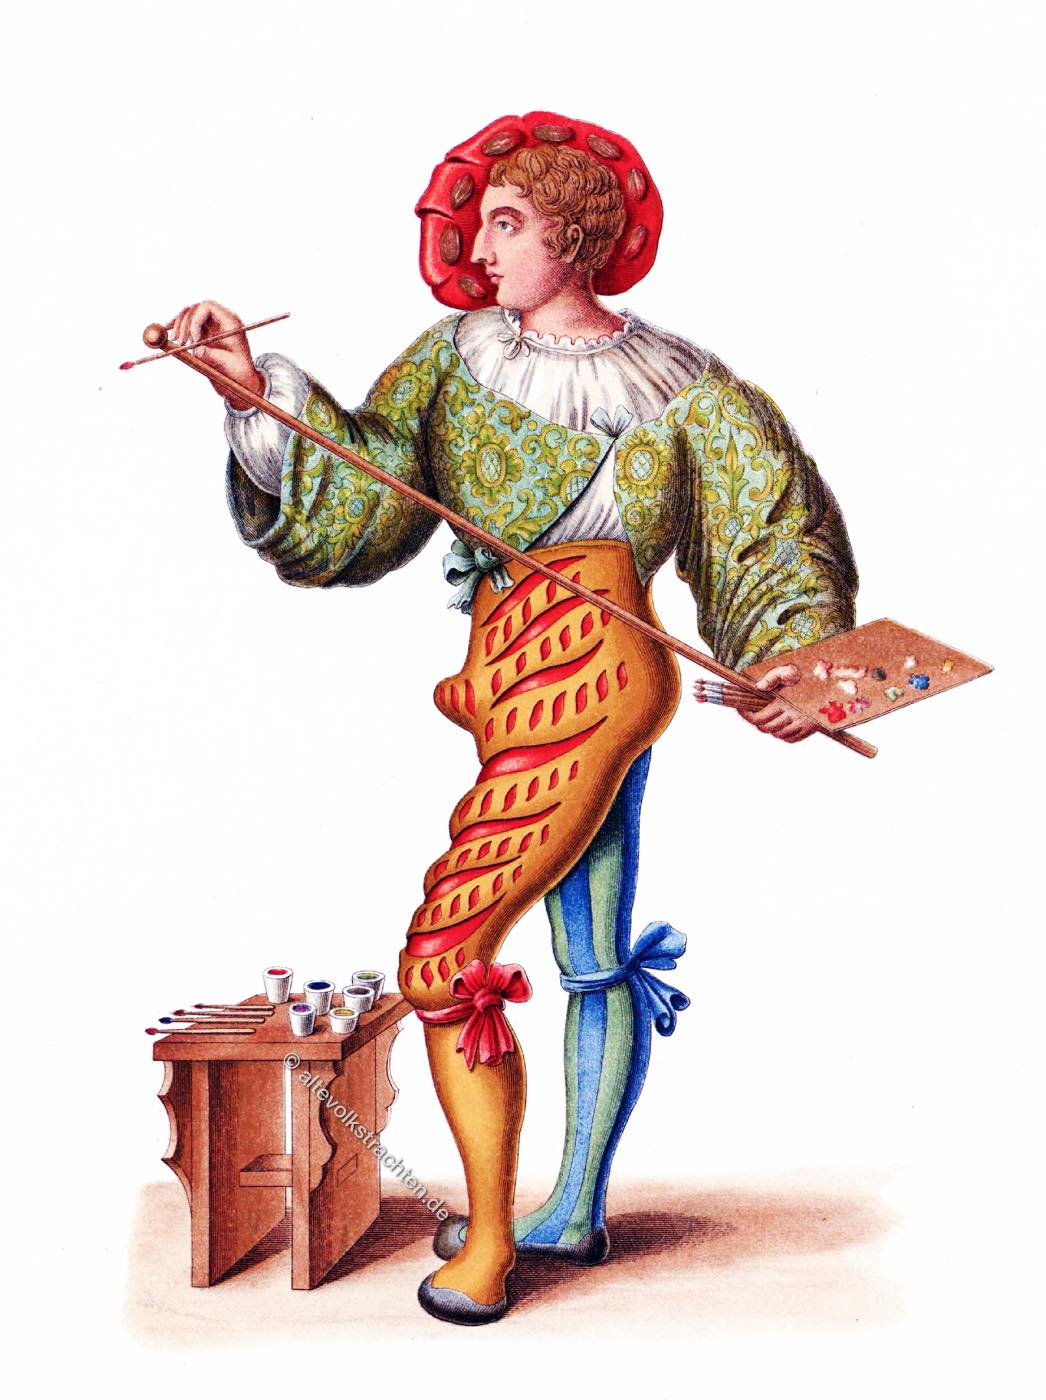 Maler, Niklaus Manuel, Hefner-Alteneck, Renaissnce, Kostüm, Bekleidung,